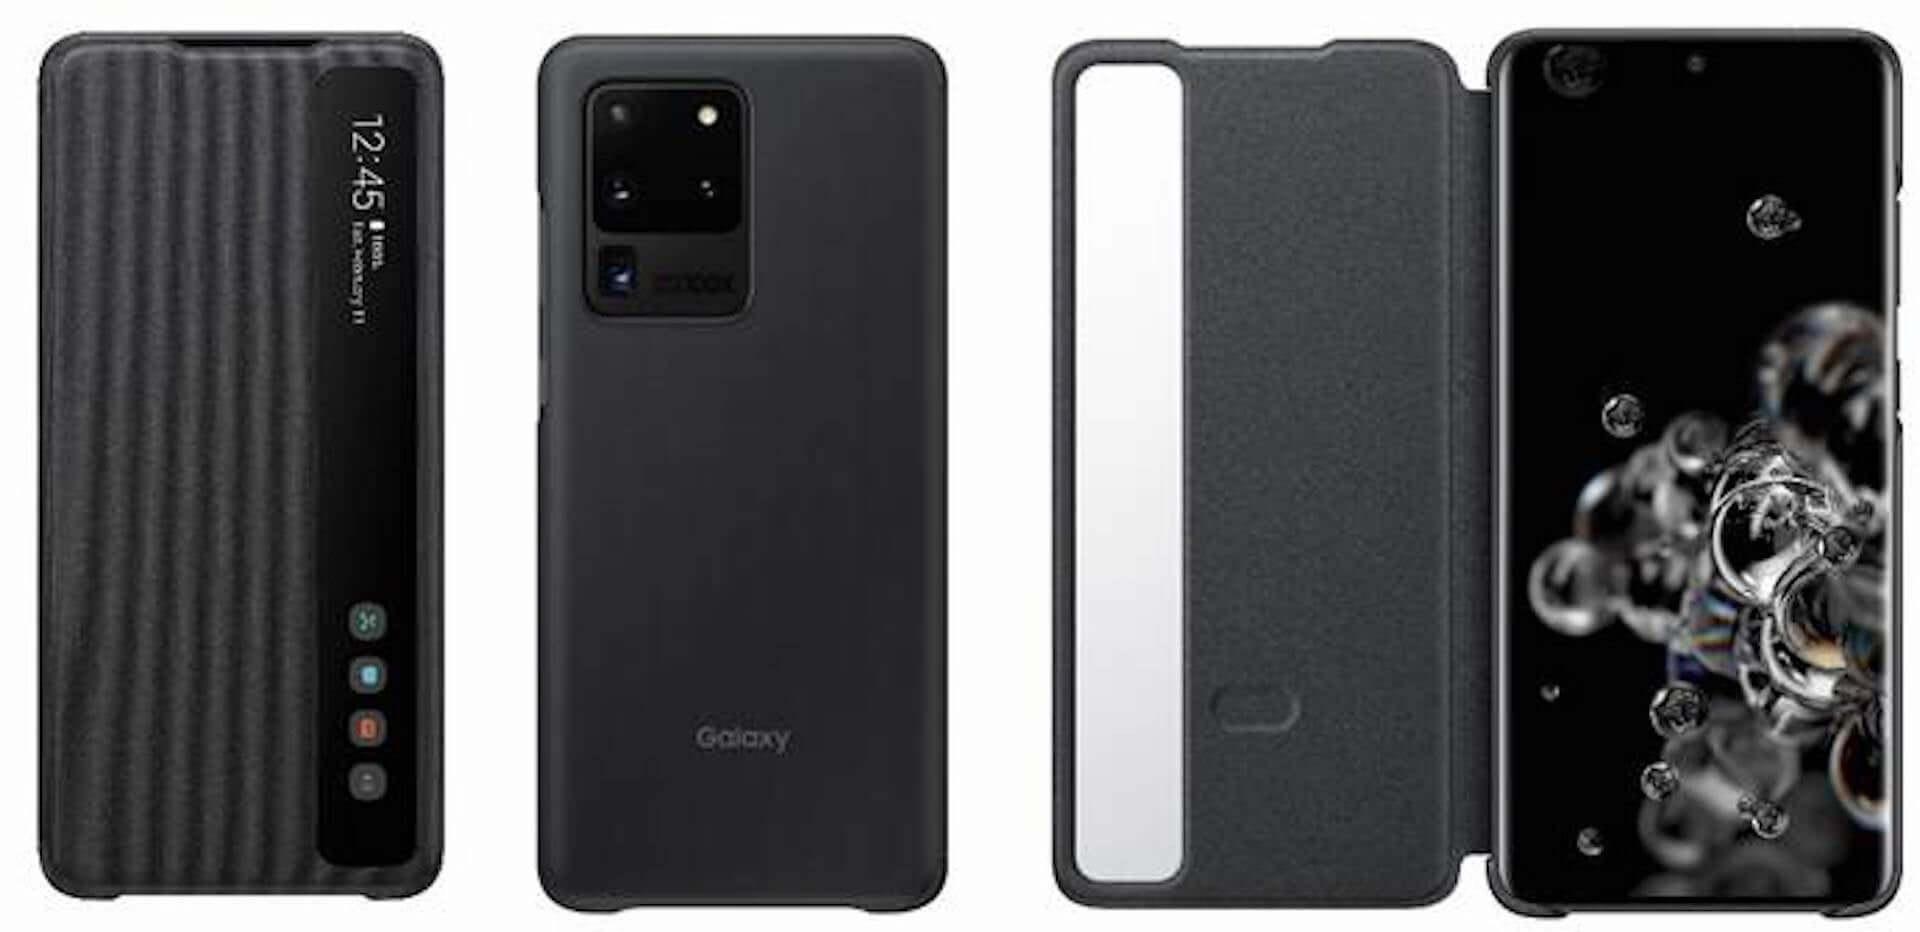 Galaxy史上最高の1億画素&100倍ズームカメラ搭載の5G対応スマホ『Galaxy S20 Ultra 5G』がKDDIから発売決定!撮影用スタンドのプレゼントキャンペーンも tech200624_galaxy_4-1920x932